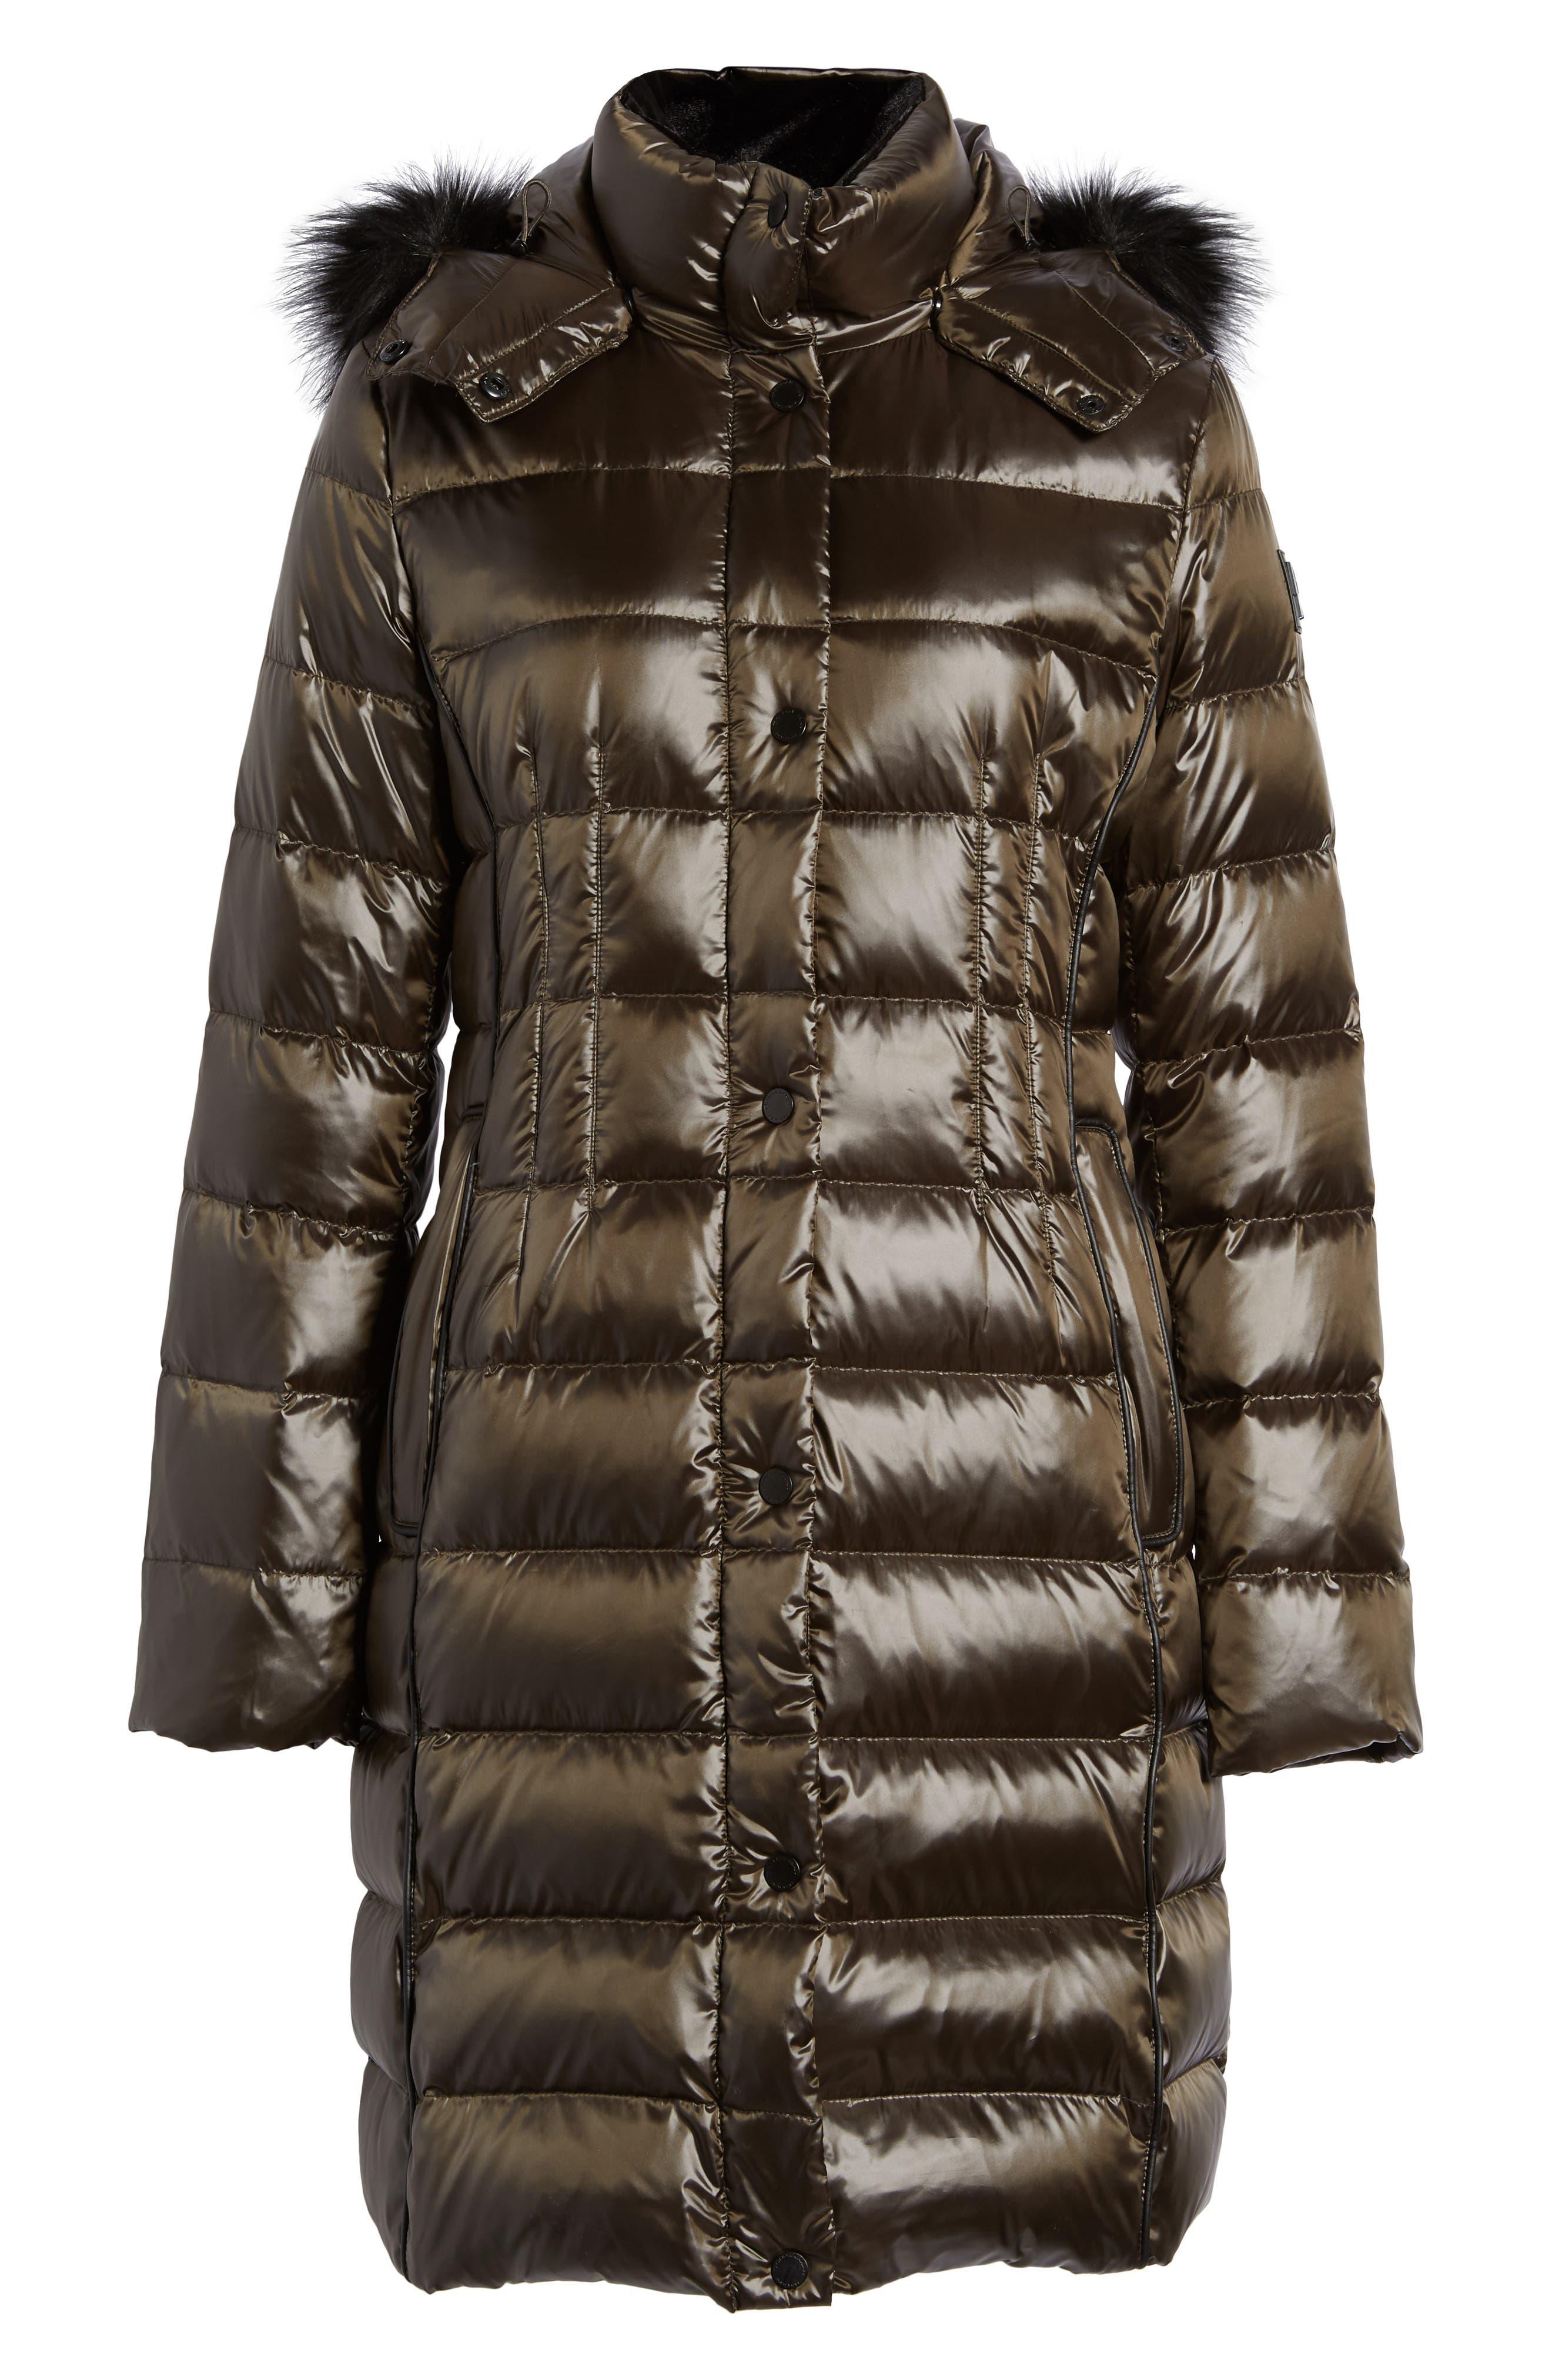 Main Image - Donna Karan New York Down Puffer Coat with Faux Fur Trim